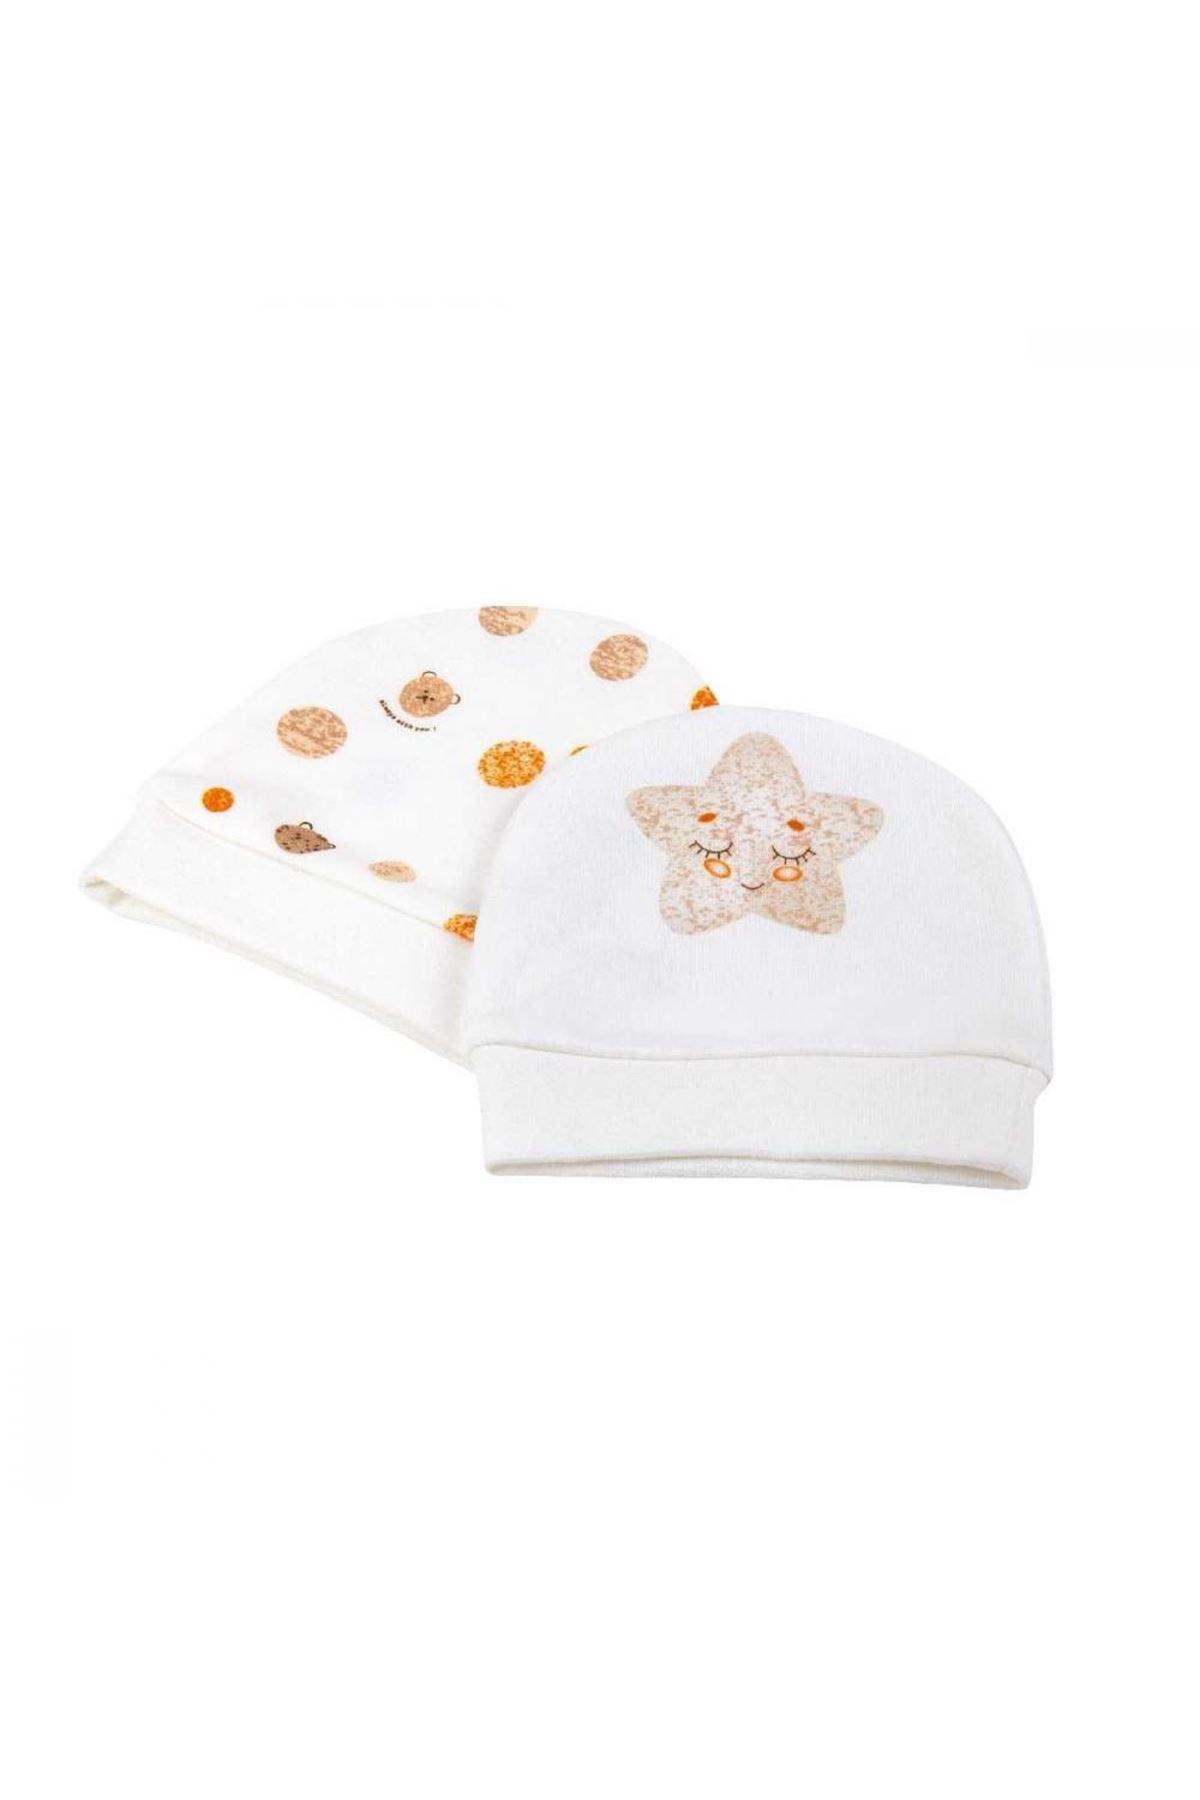 Bibaby Bi Organik Star Smile Şapka 2Lİ 72118 Turuncu